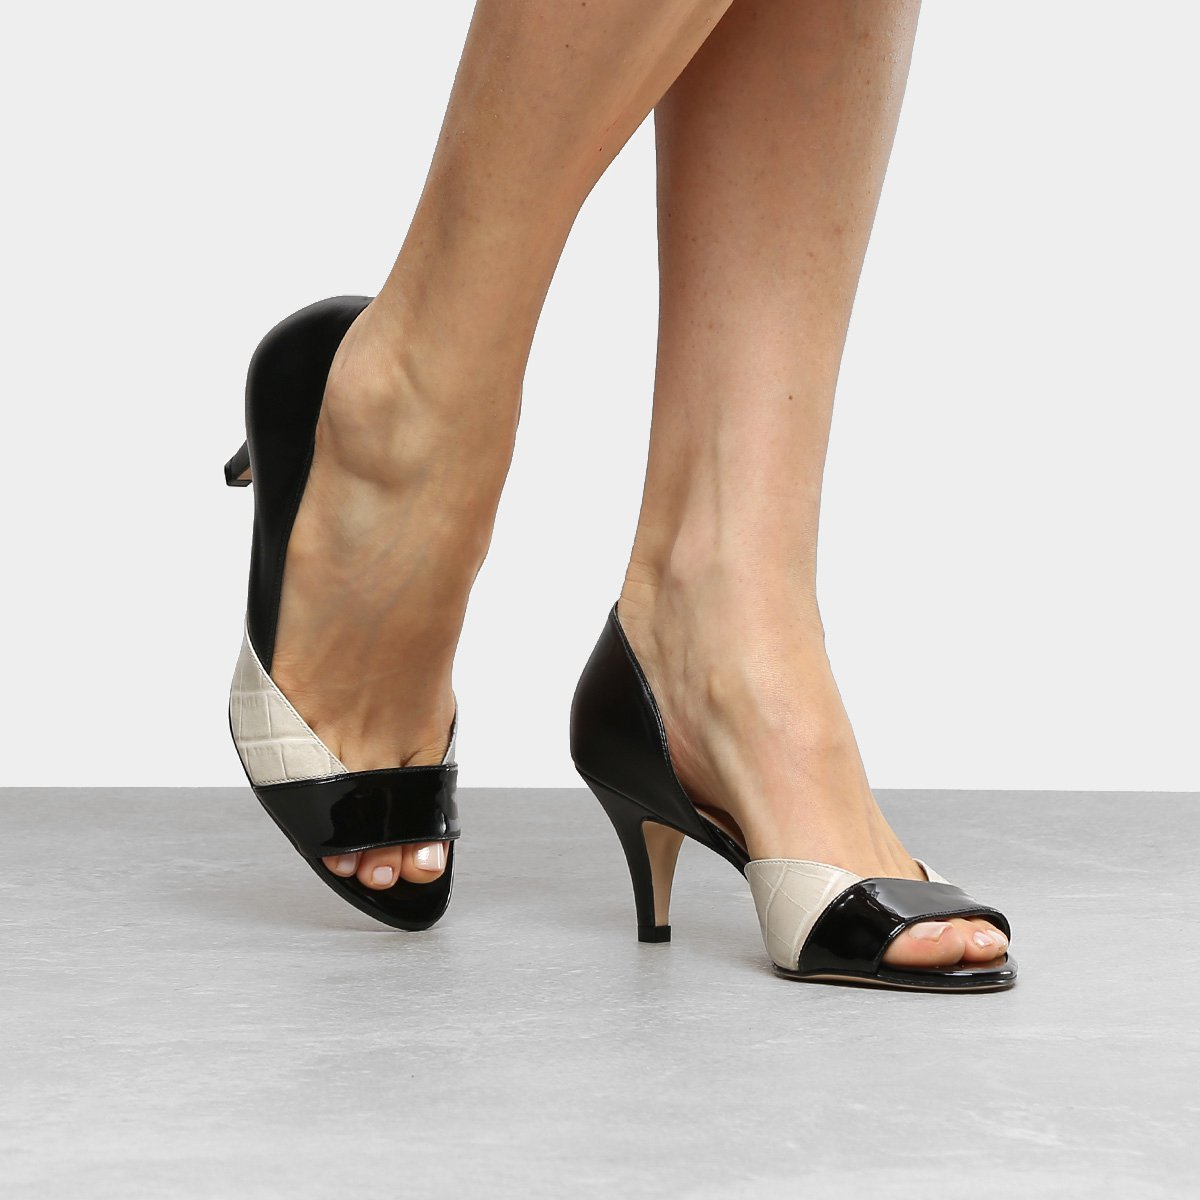 Peep White Médio Salto Shoestock Toe Preto Texturas Off e rAFwTrq